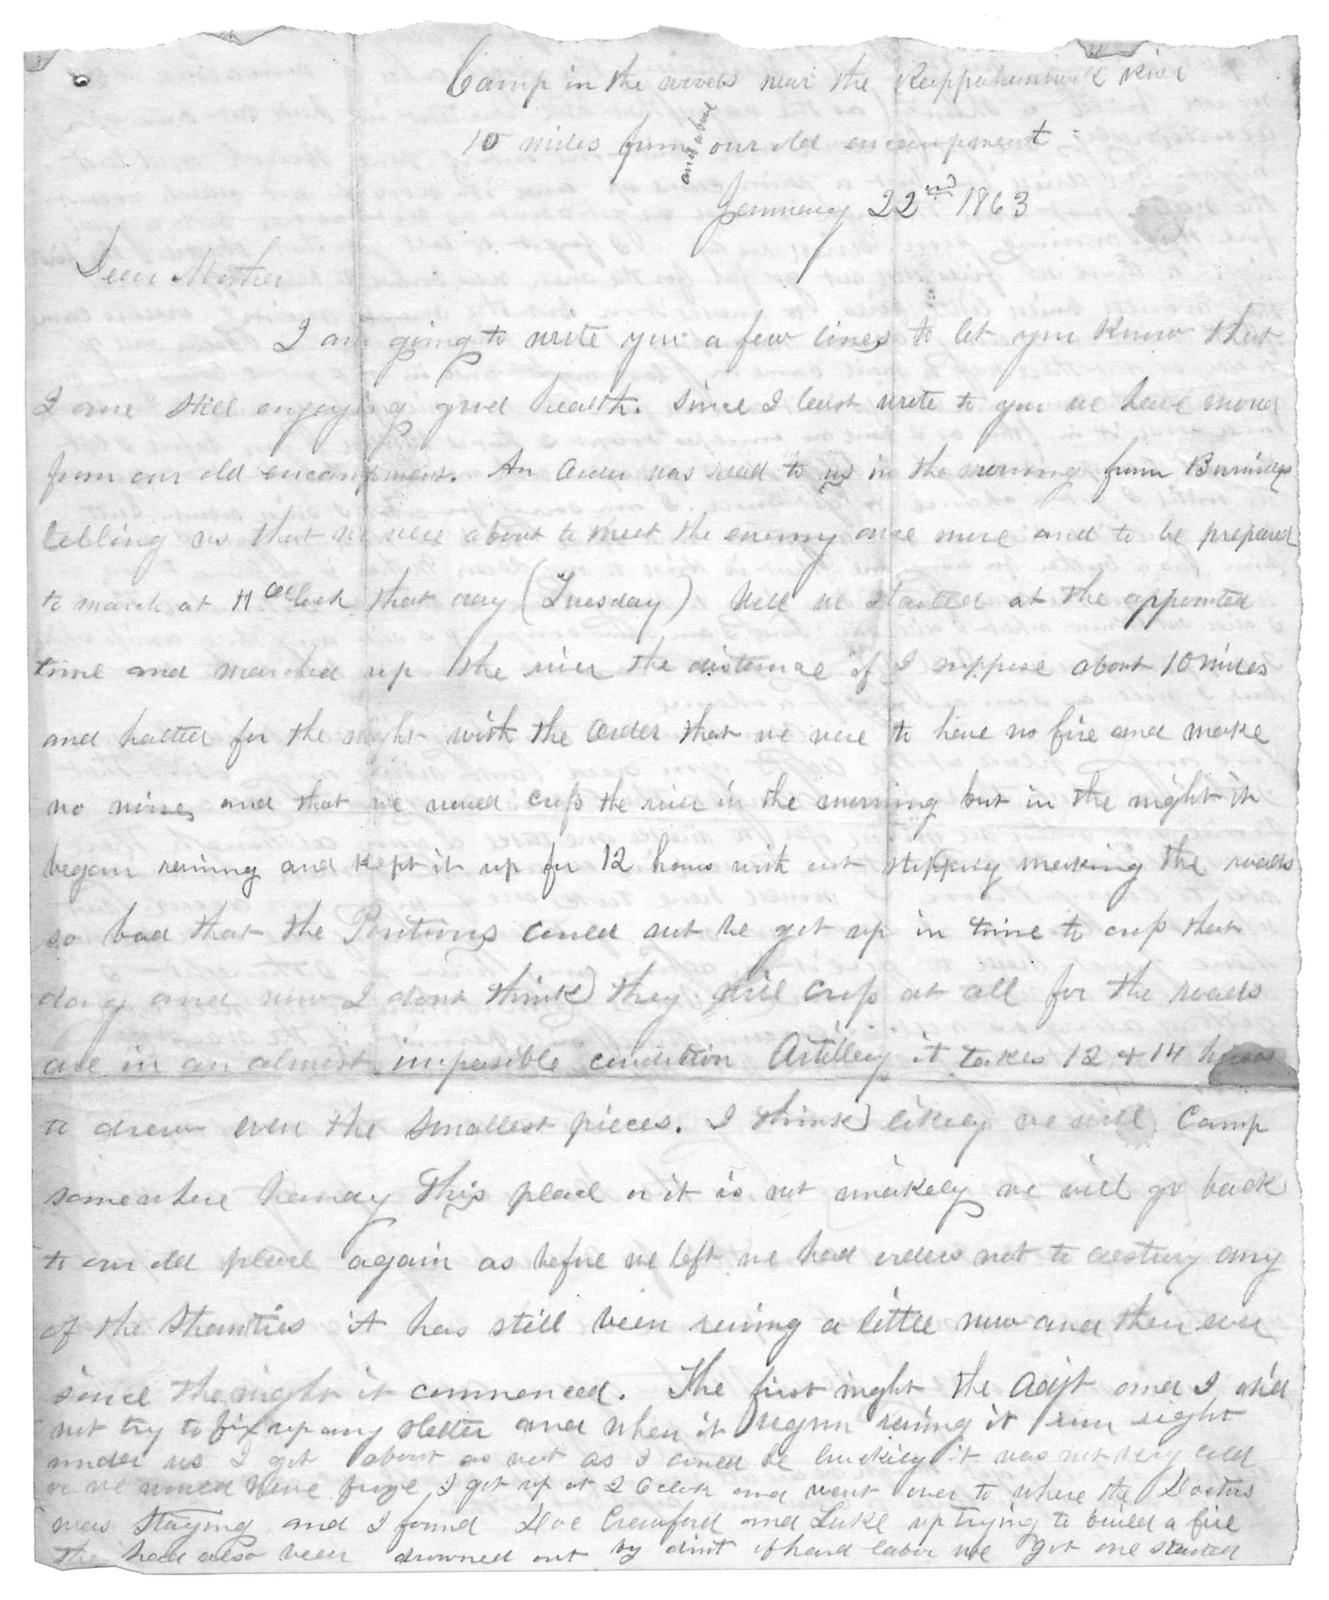 Letter from Tilton C. Reynolds to Juliana Smith Reynolds, January 22, 1863